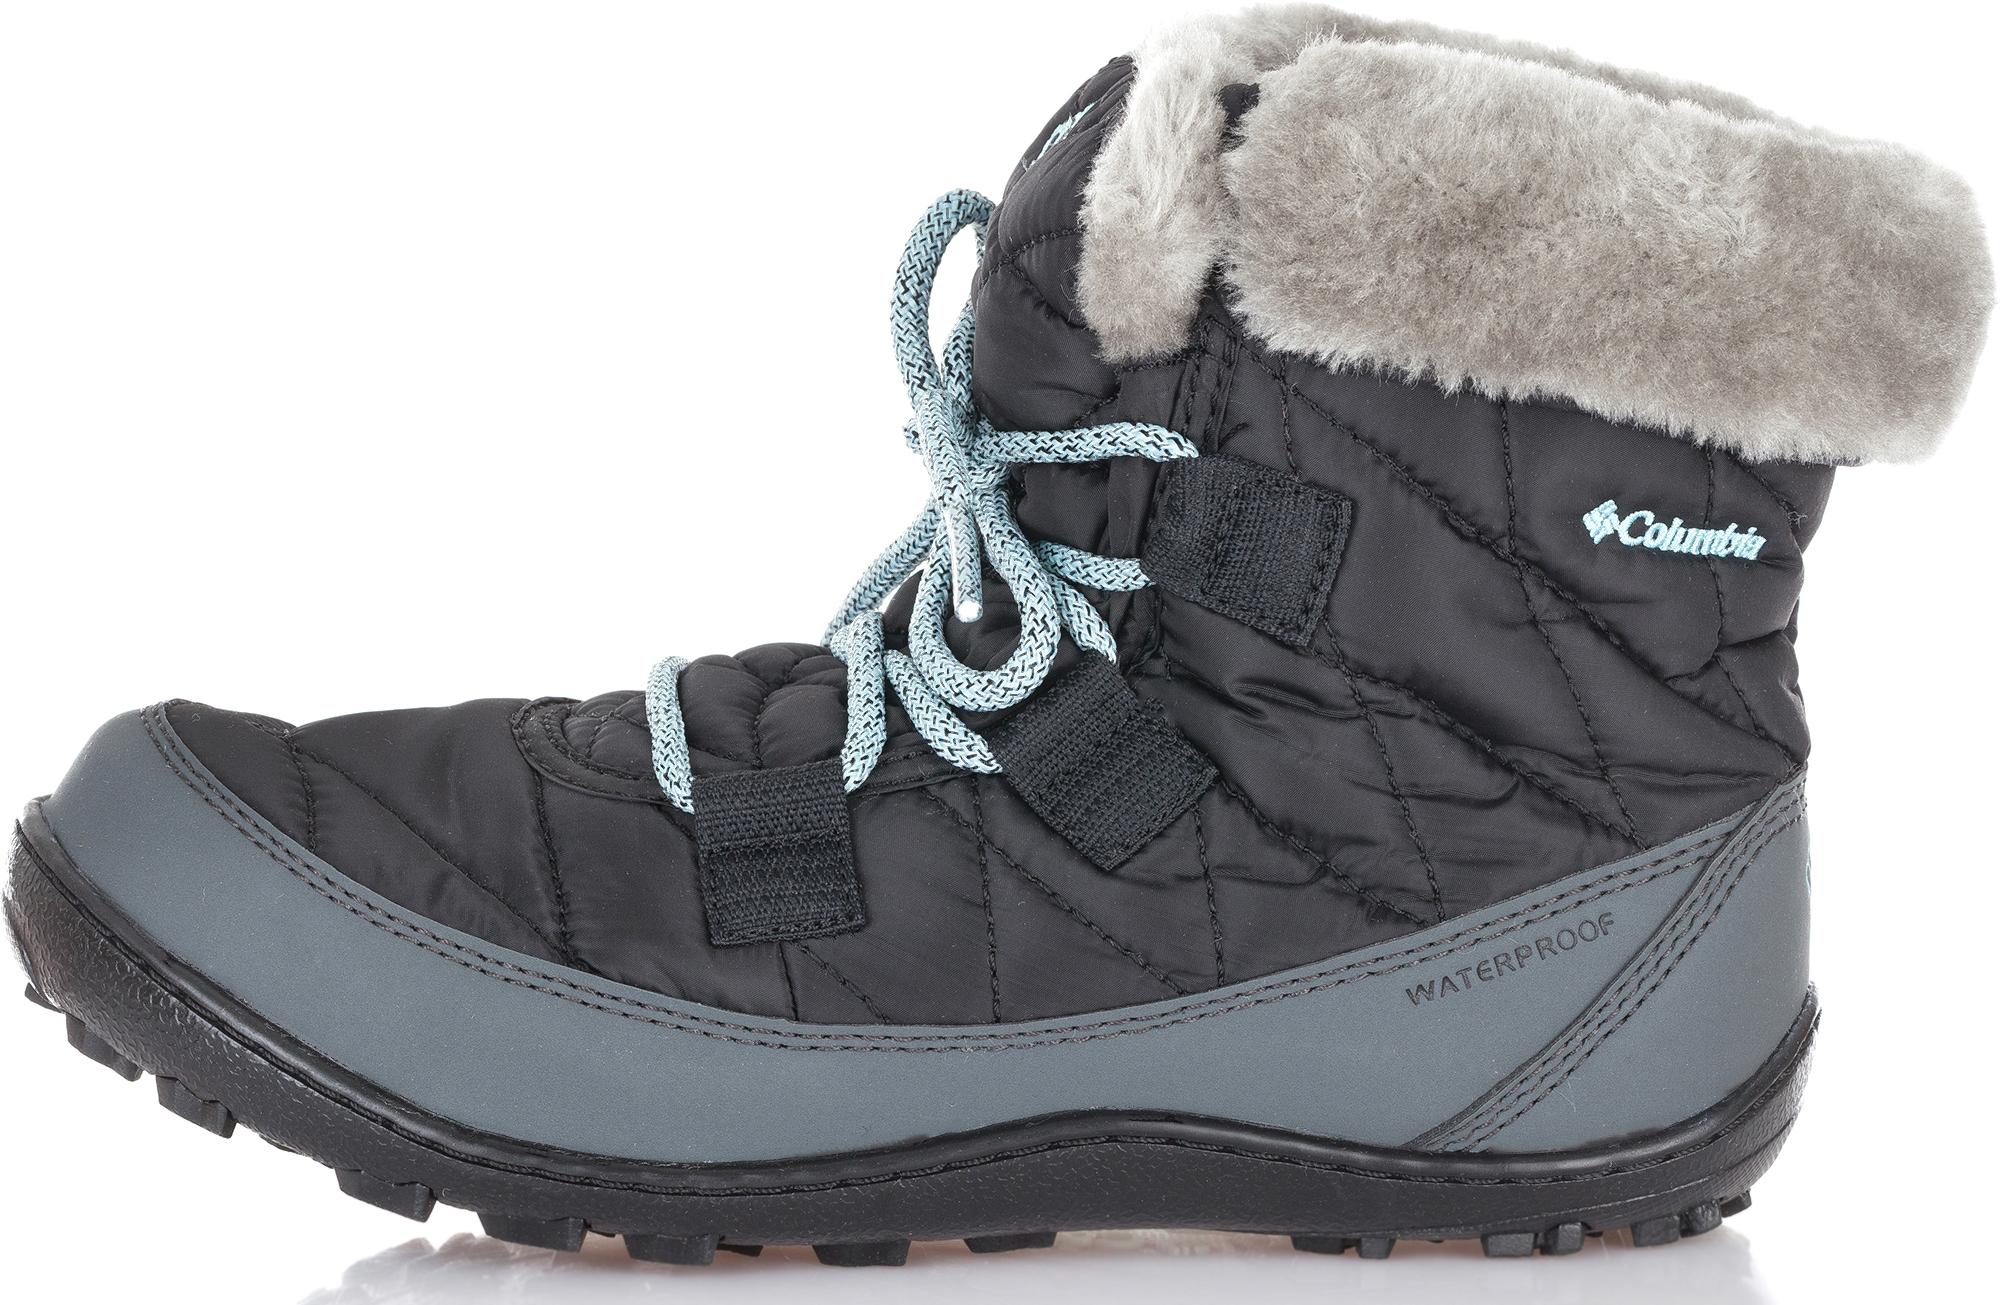 Columbia Ботинки утепленные для девочек Columbia Youth Minx Shorty Omni-Heat WP, размер 33